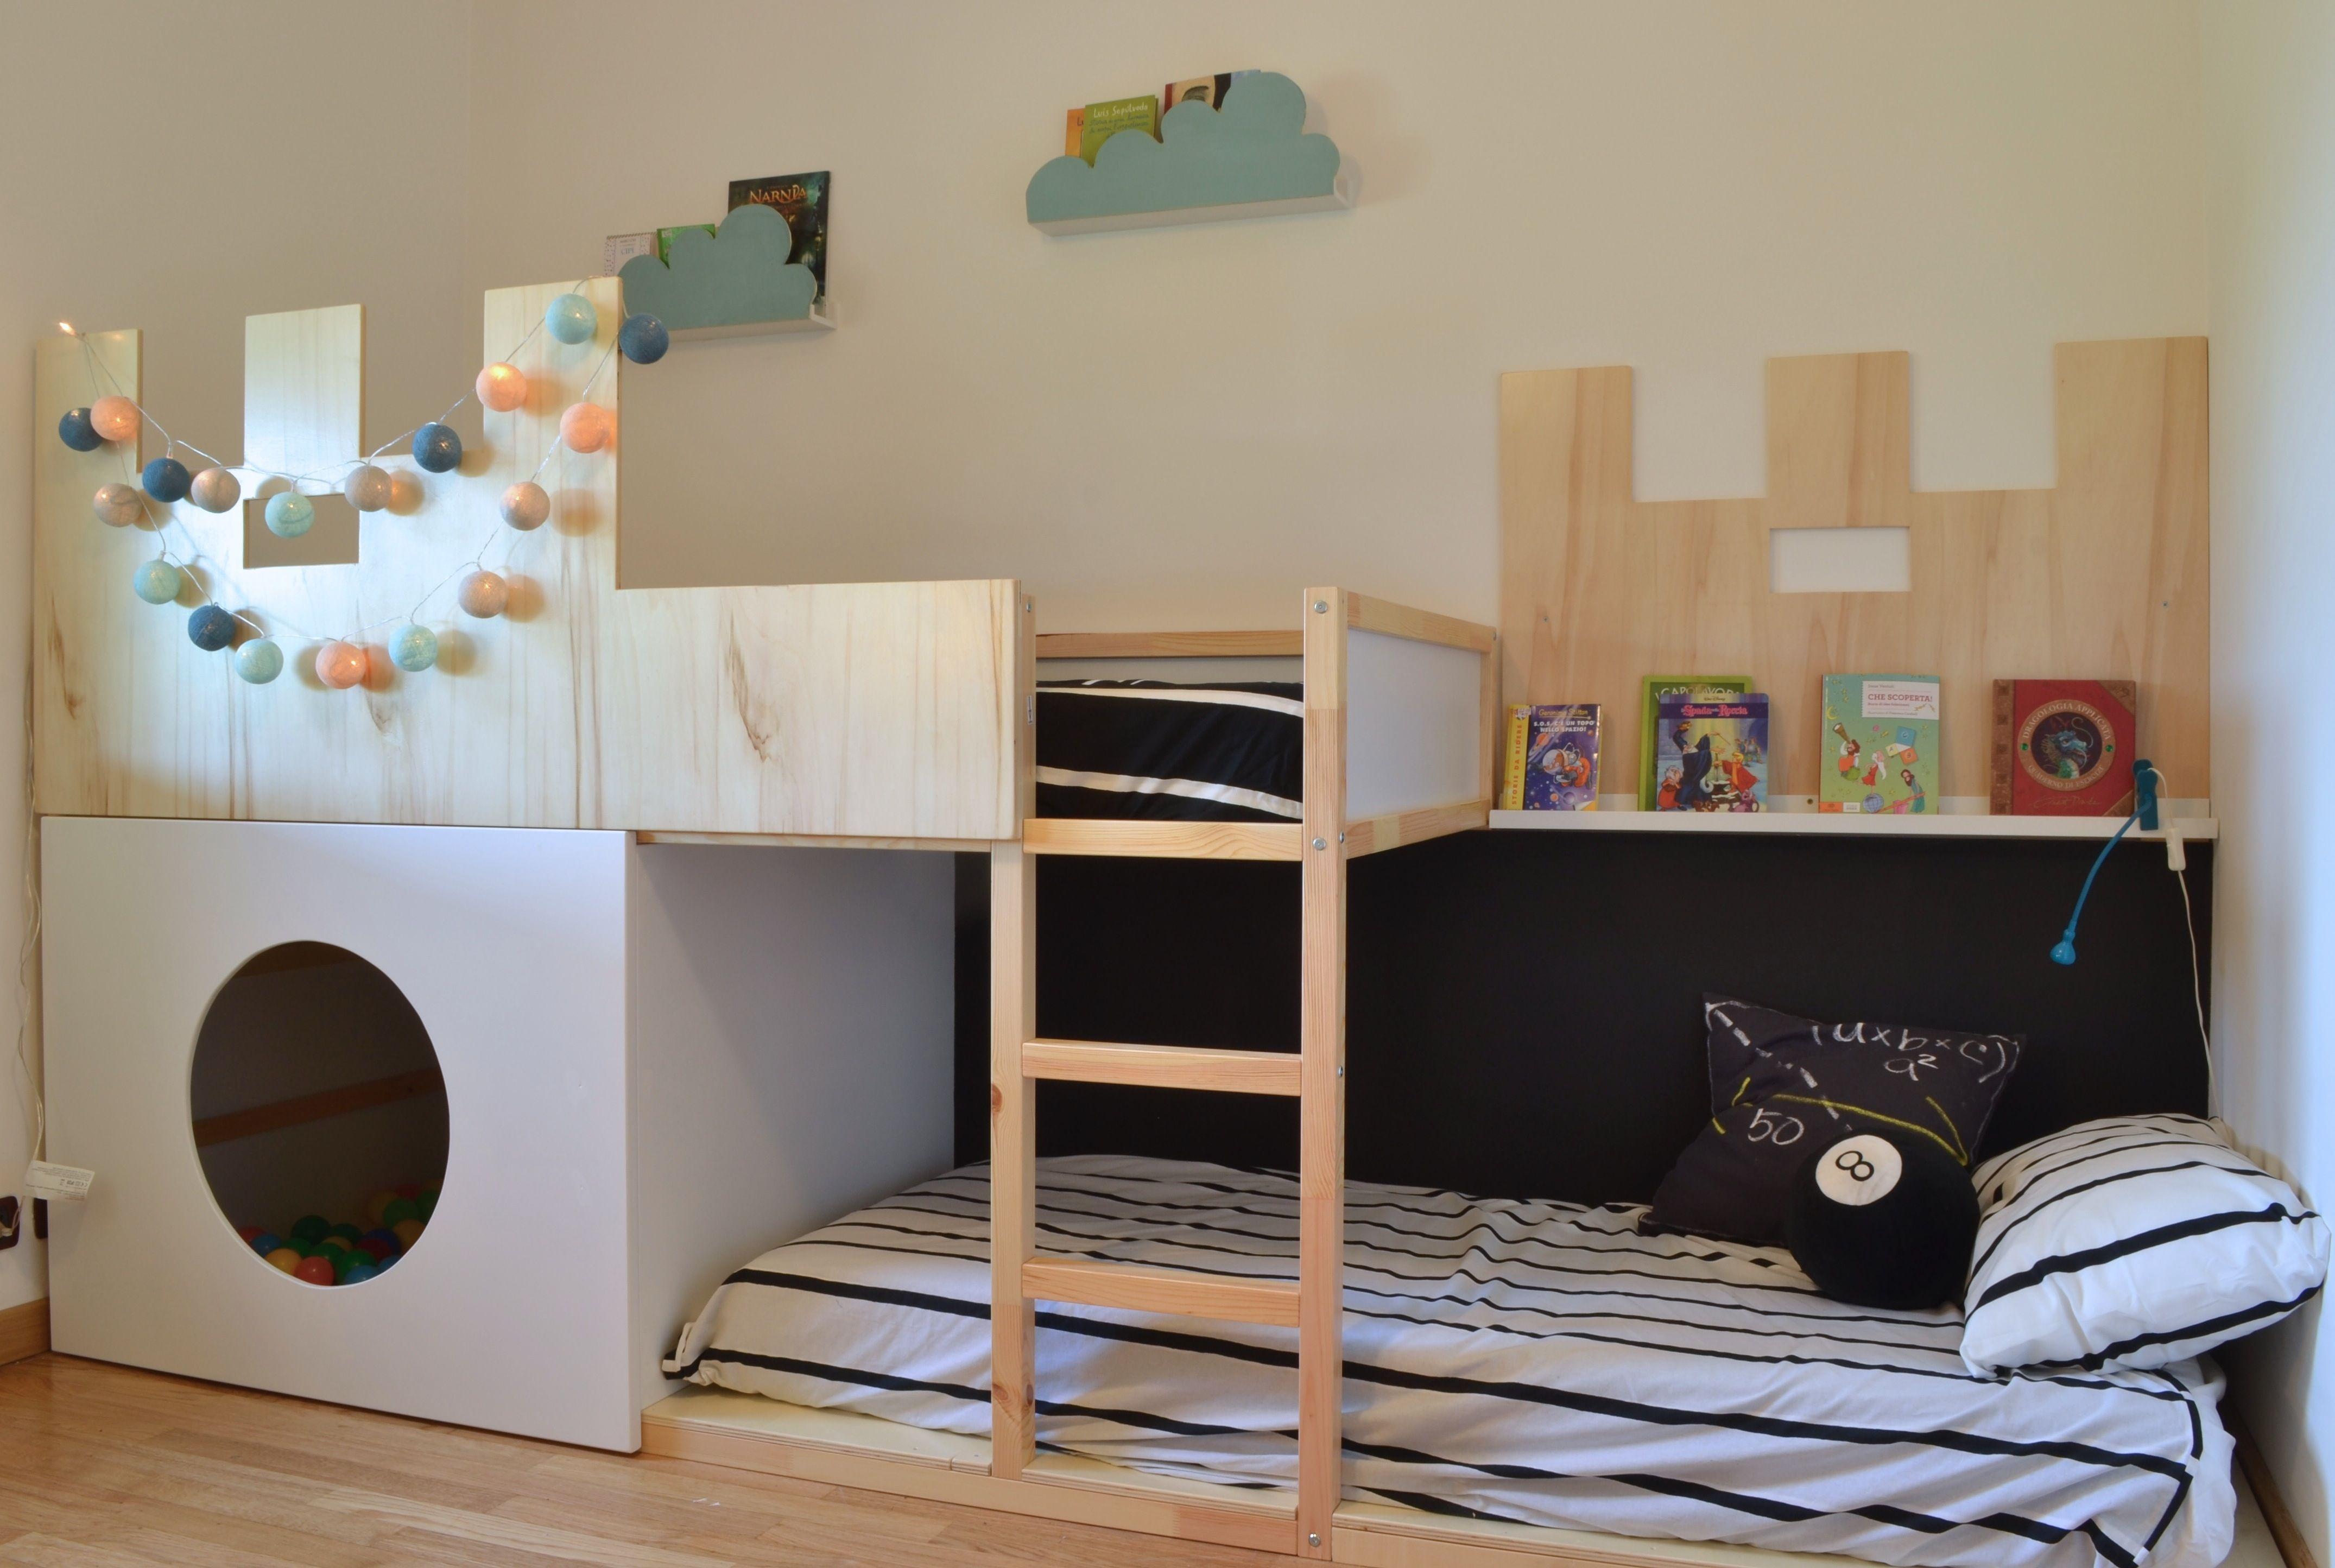 Etagenbett Zelt : Zelt kinderzimmer ikea hellweg etagenbett